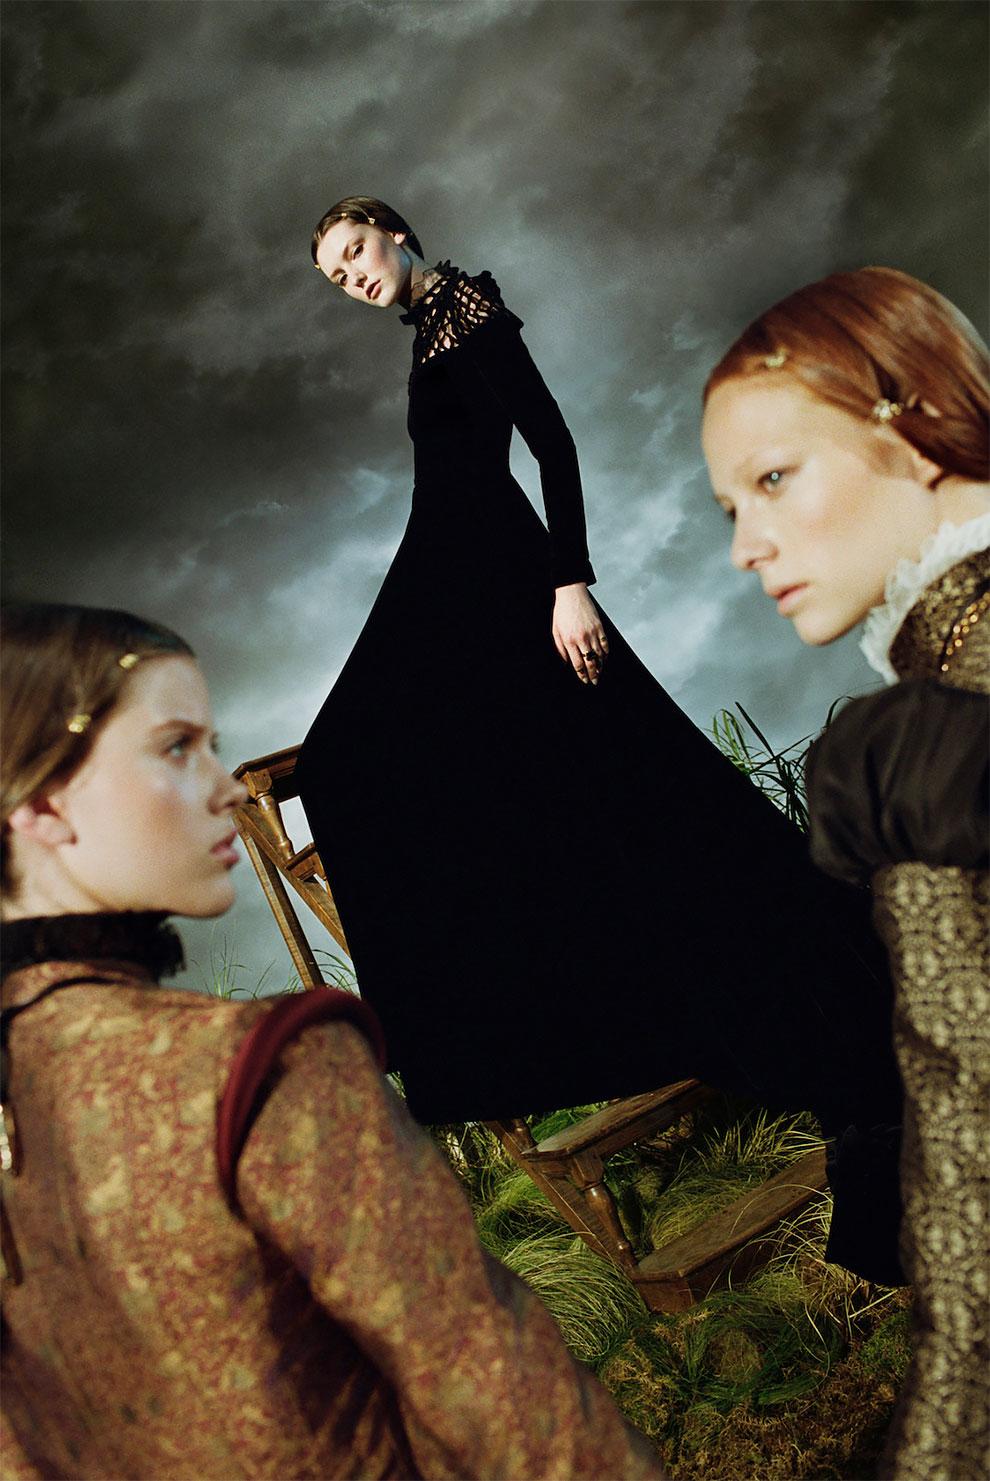 Чешский фотограф Михал Пуделка девочки, девочки, девочки (8).jpg